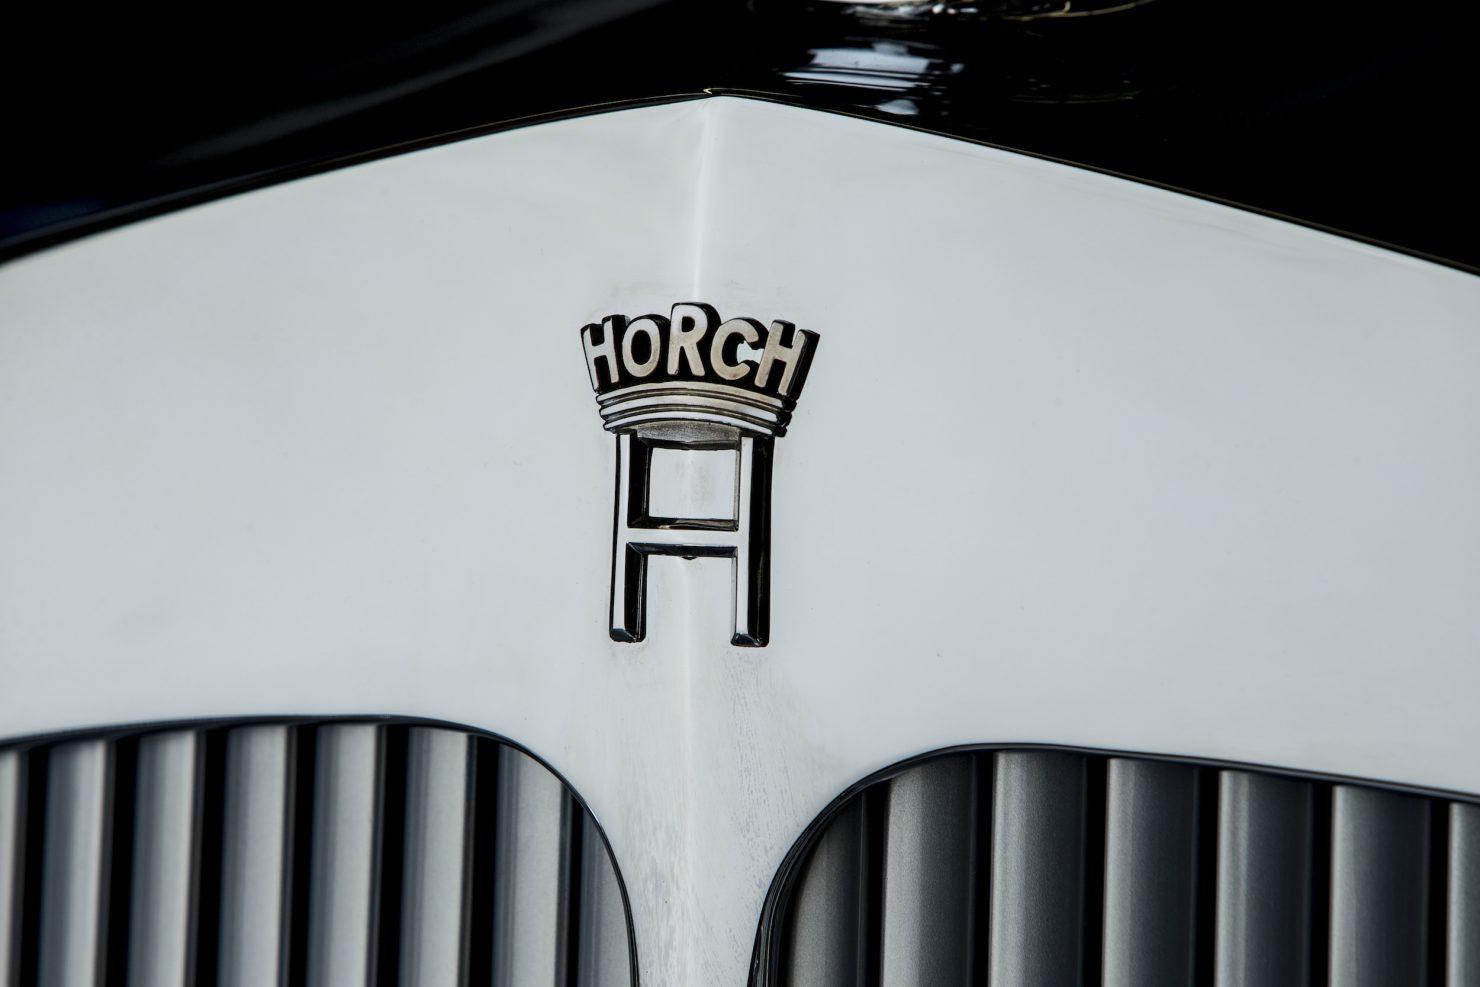 Horch 853 Spezialroadster 6 1480x987 - 1936 Horch 853 Spezialroadster